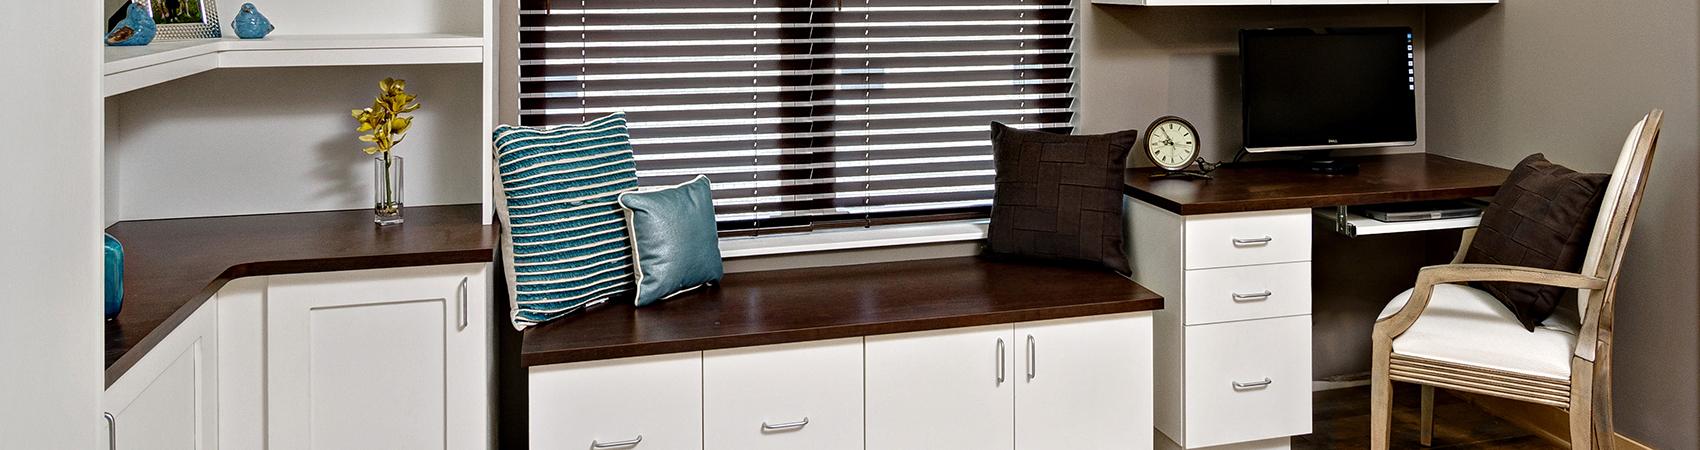 window-bench-new